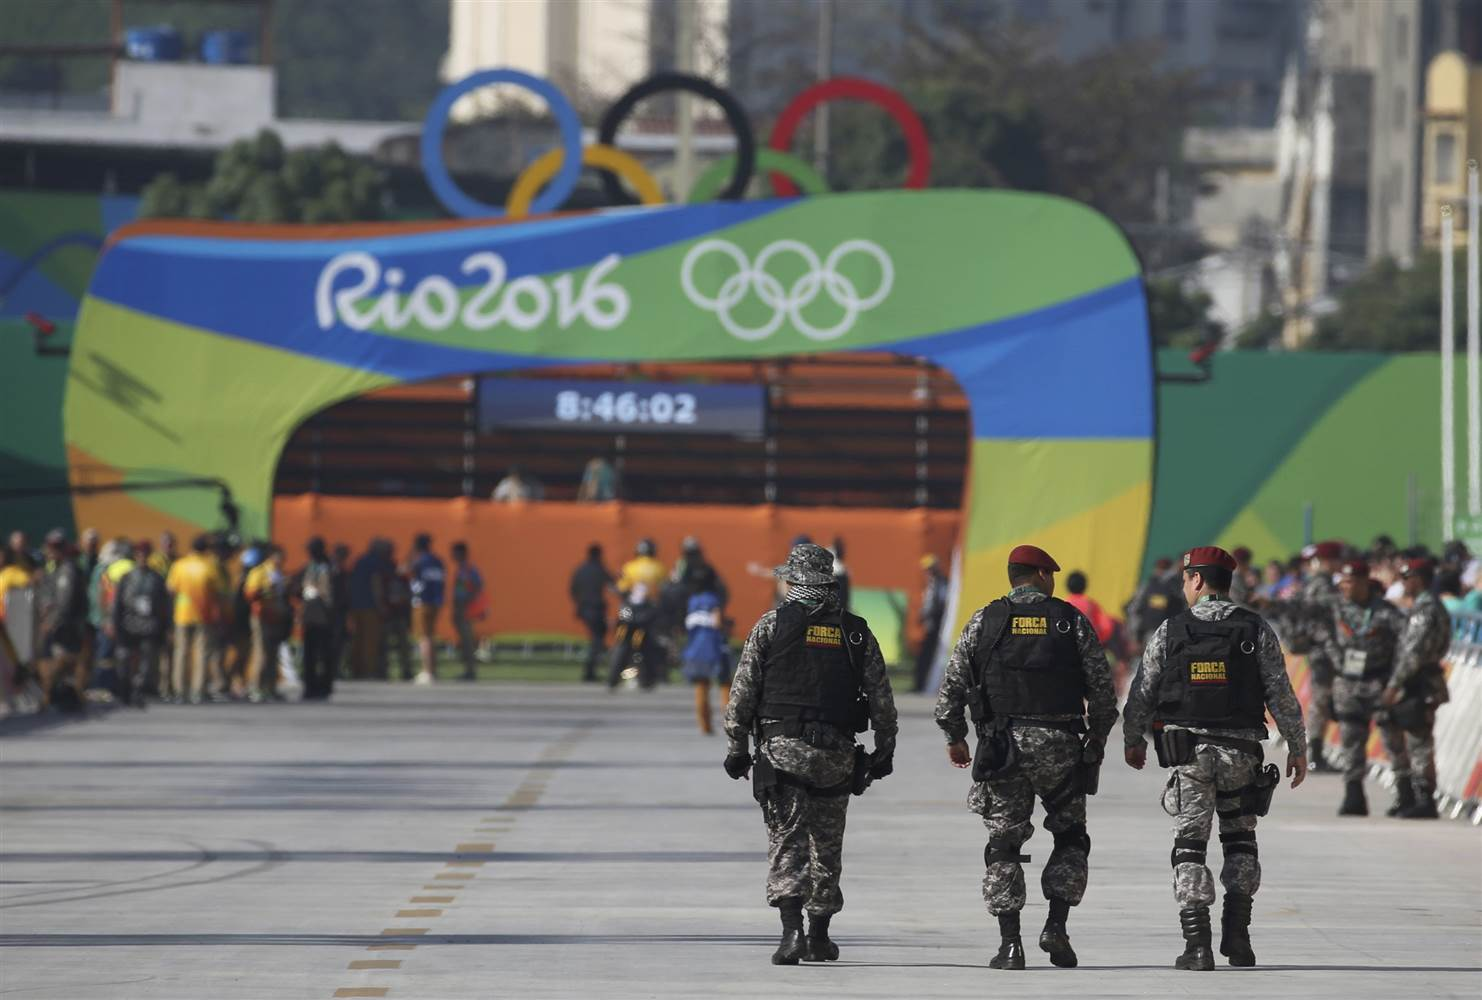 160902-rio-olympics-security-559p_011decf3330593bfe58d2450a8e2346d.nbcnews-ux-2880-1000.jpg